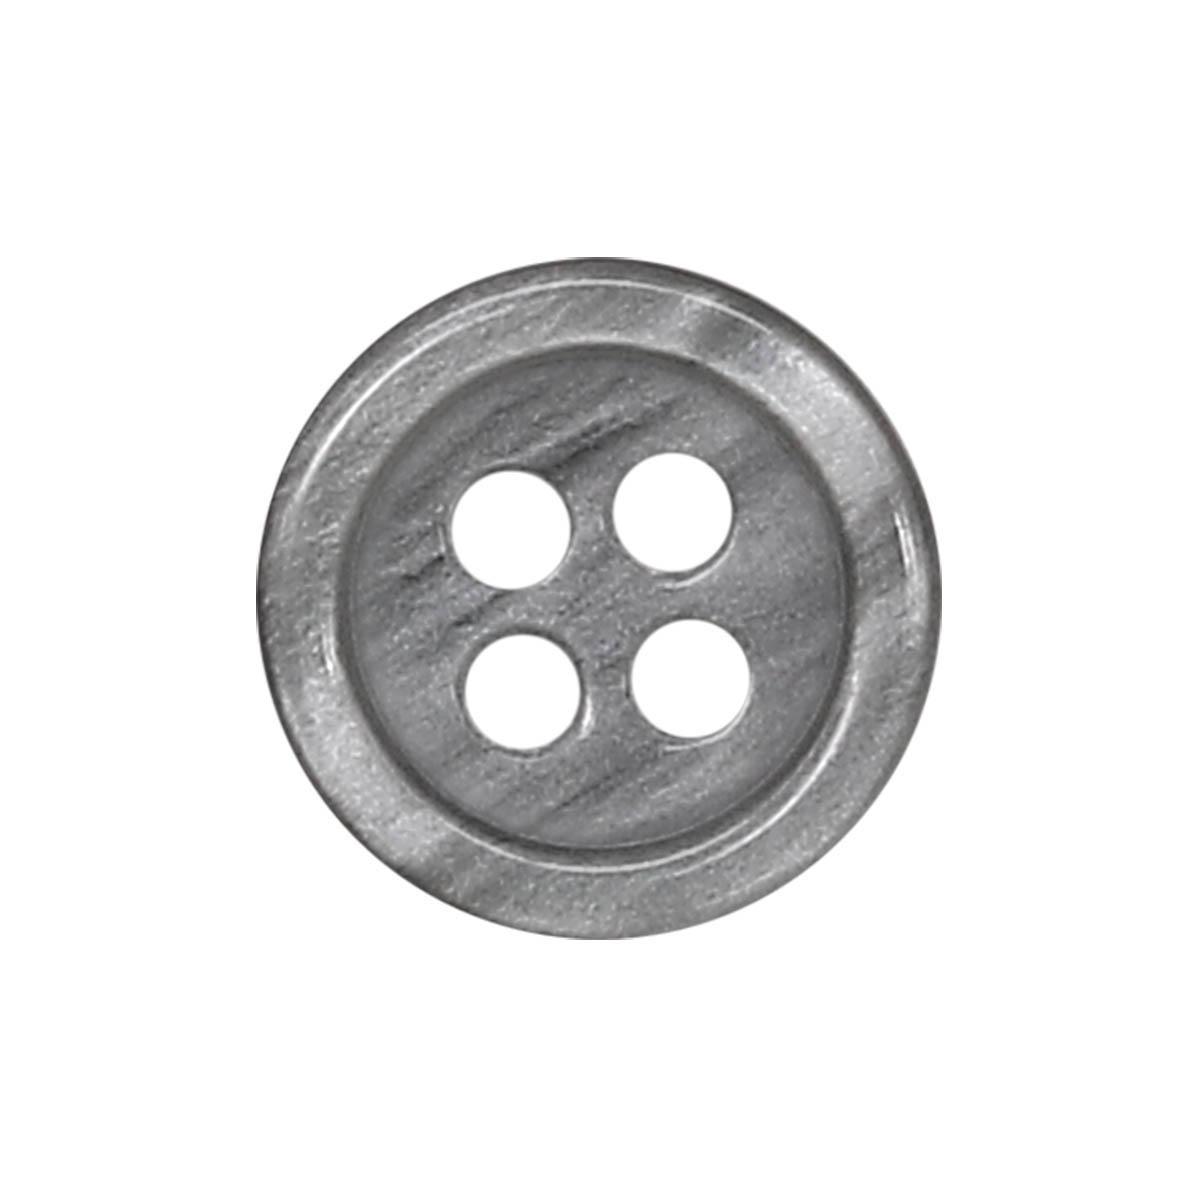 35483/4 18 (3504) Пуговица 4прокола сер.глянц.полиэстер